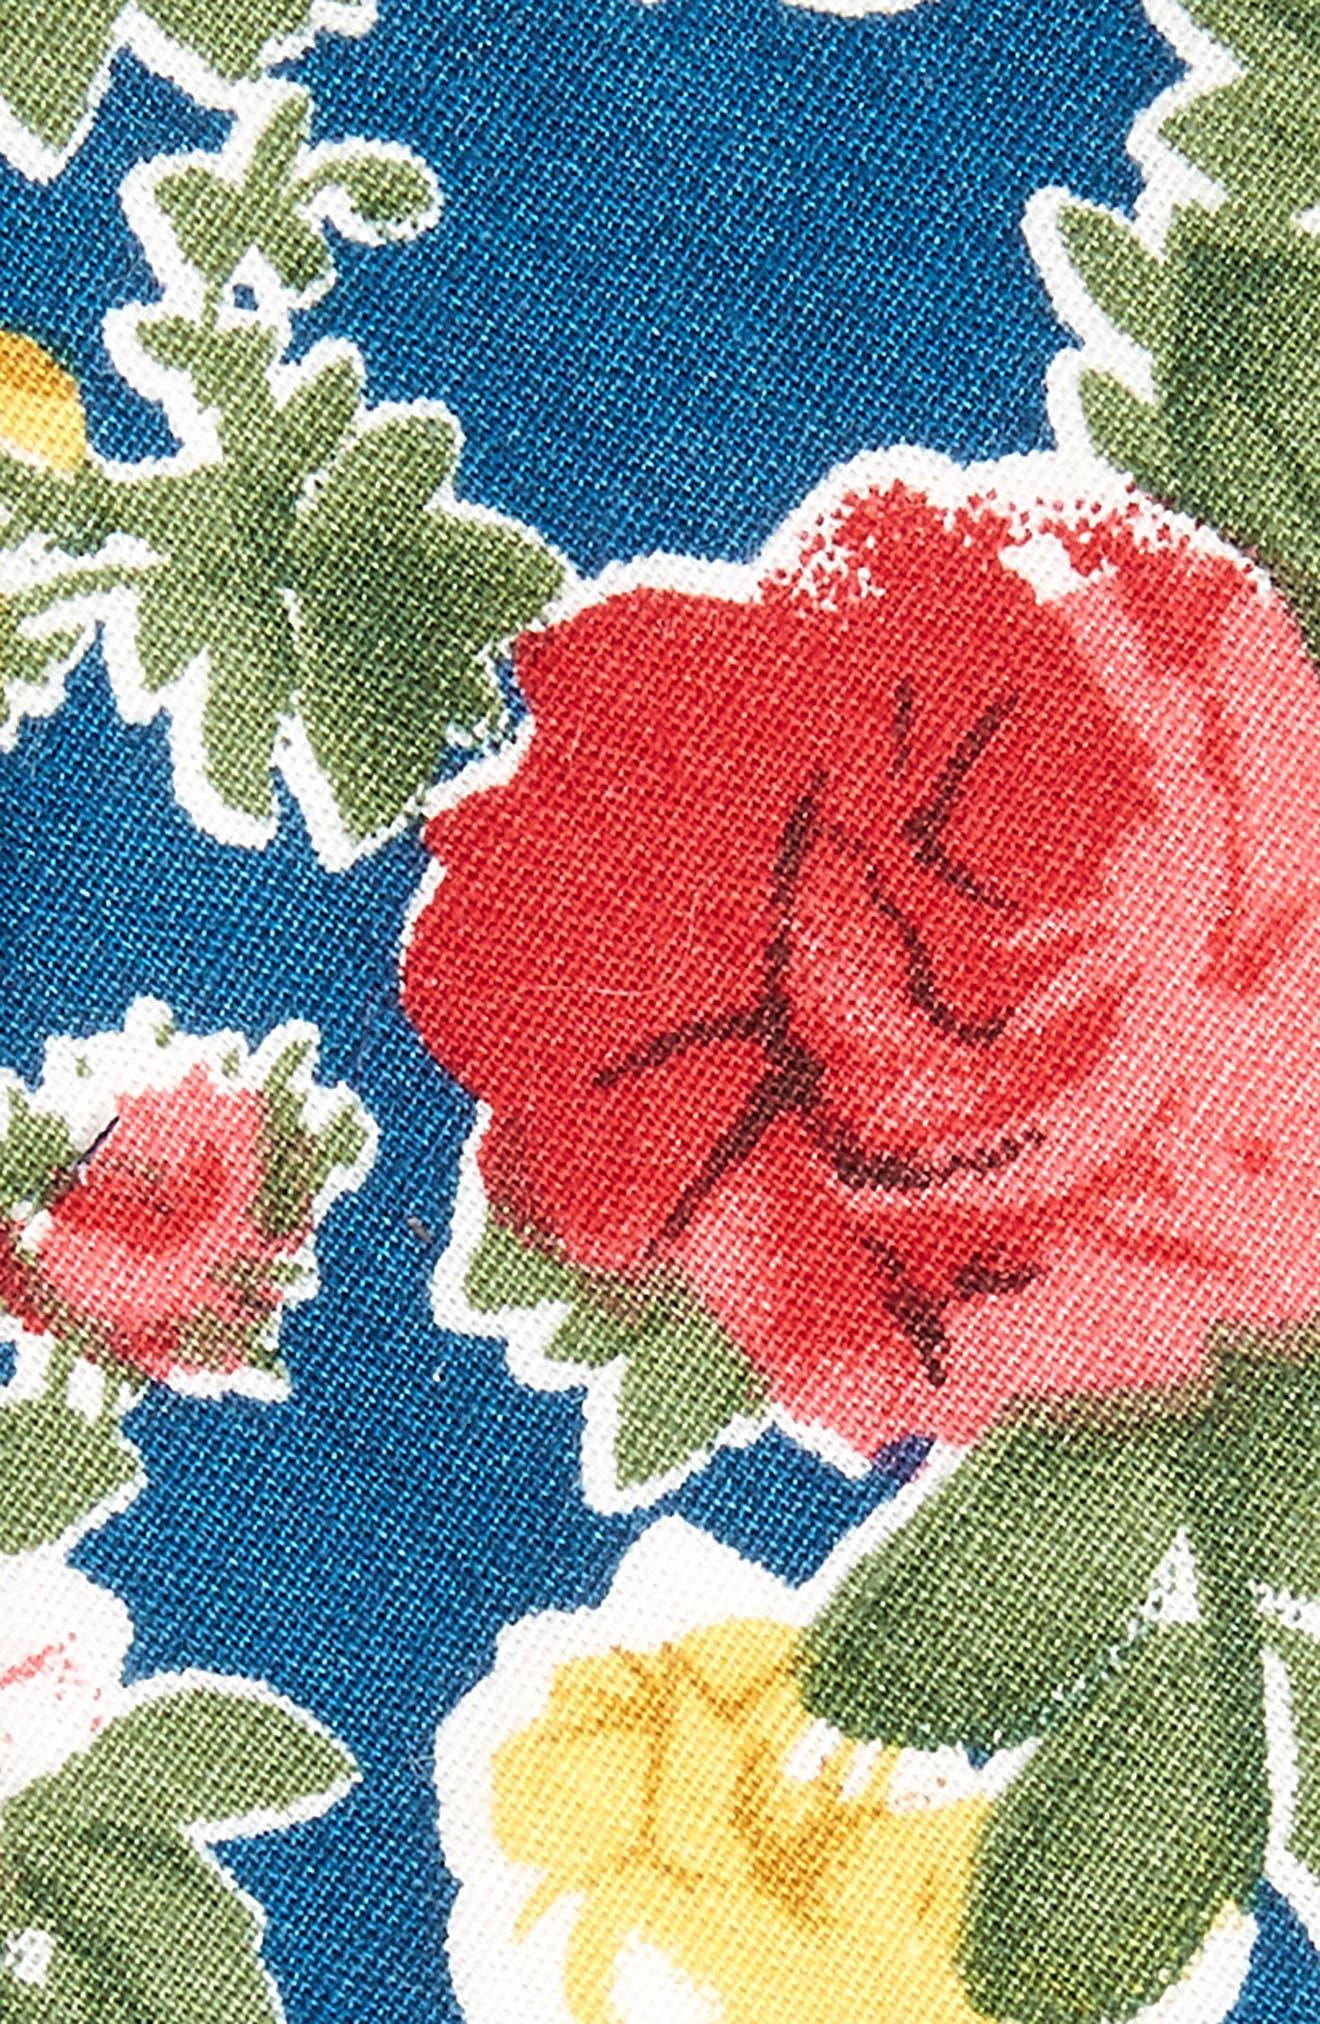 Iverson Floral Cotton Skinny Tie,                             Alternate thumbnail 4, color,